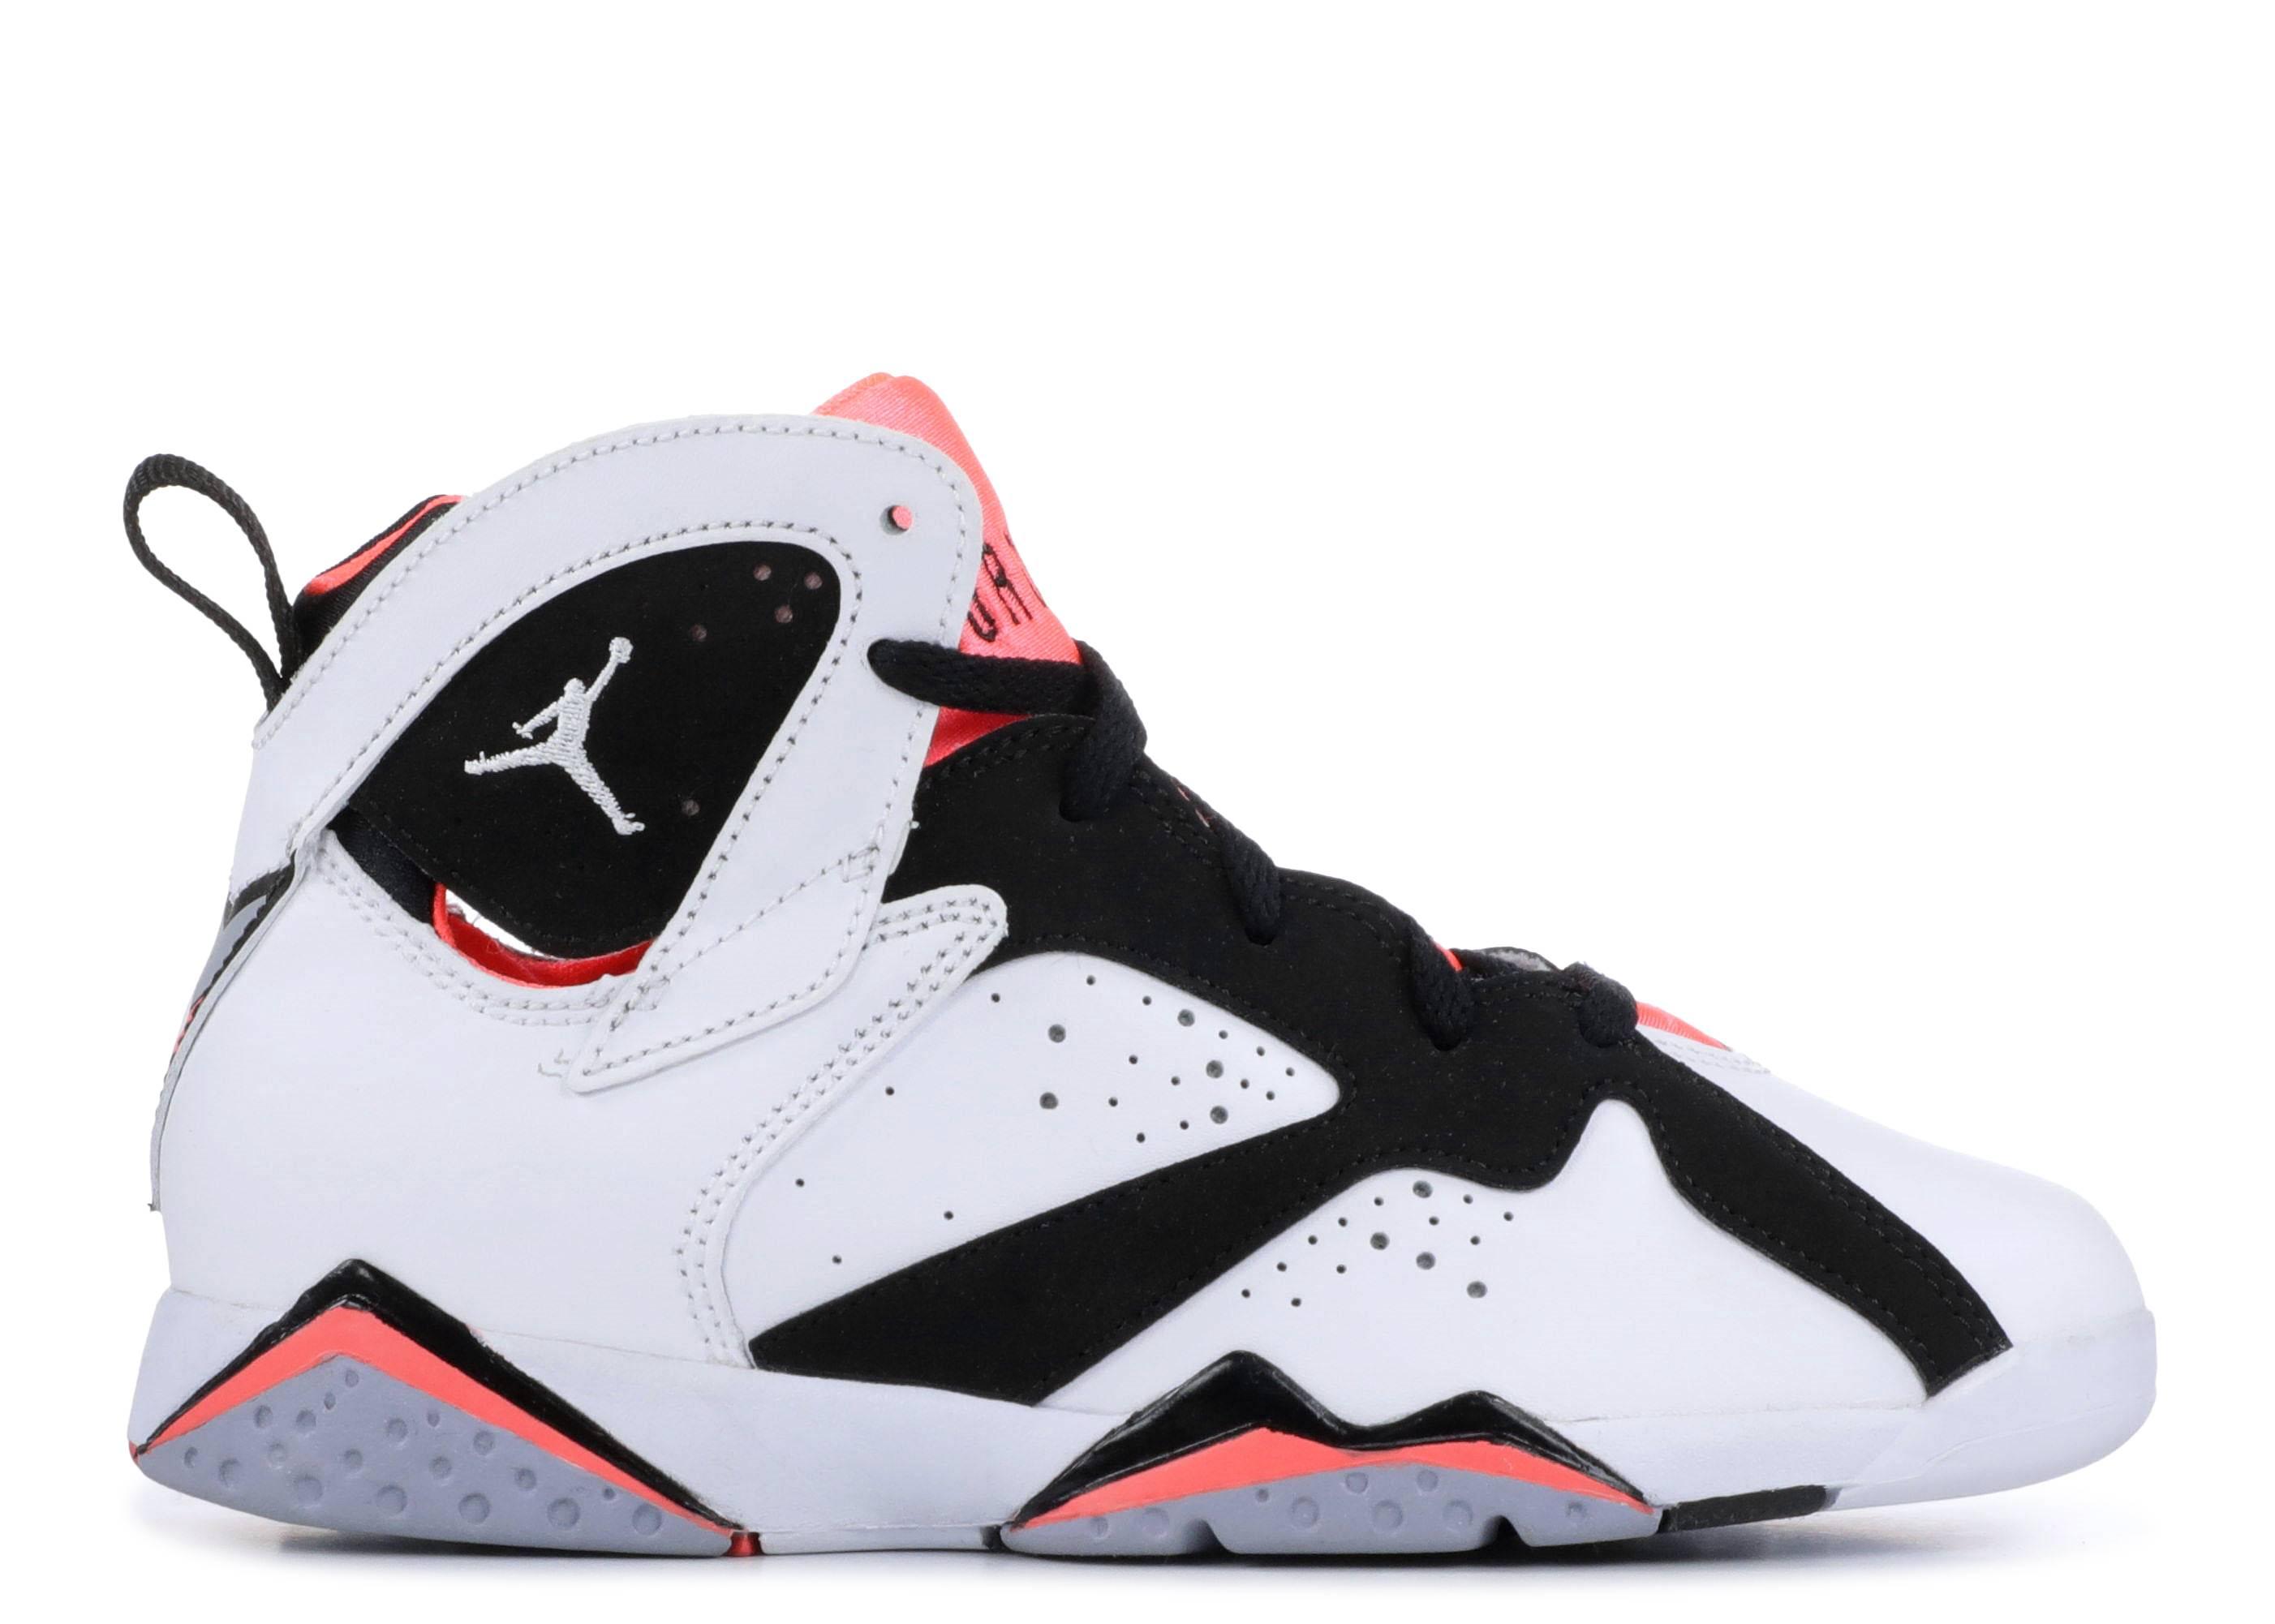 b5f2dd5ddd8f28 Jordan Retro 7 - Air Jordan - 442961 106 - white black hot lava grey ...